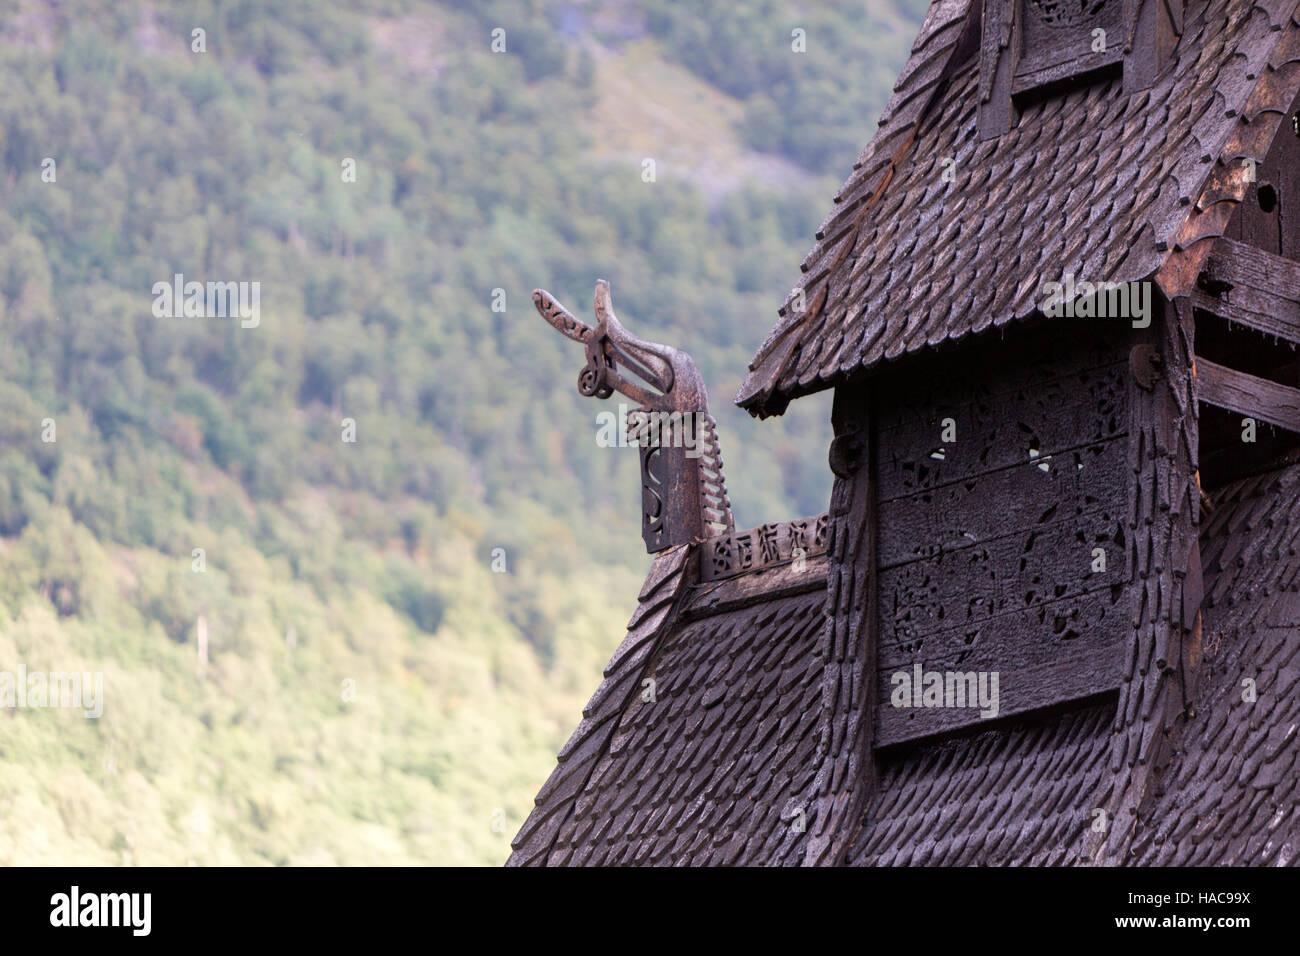 On the gables end of the roof, Borgund Stave Church,  Borgund, Lærdal, Sogn og Fjordane, Norway. - Stock Image